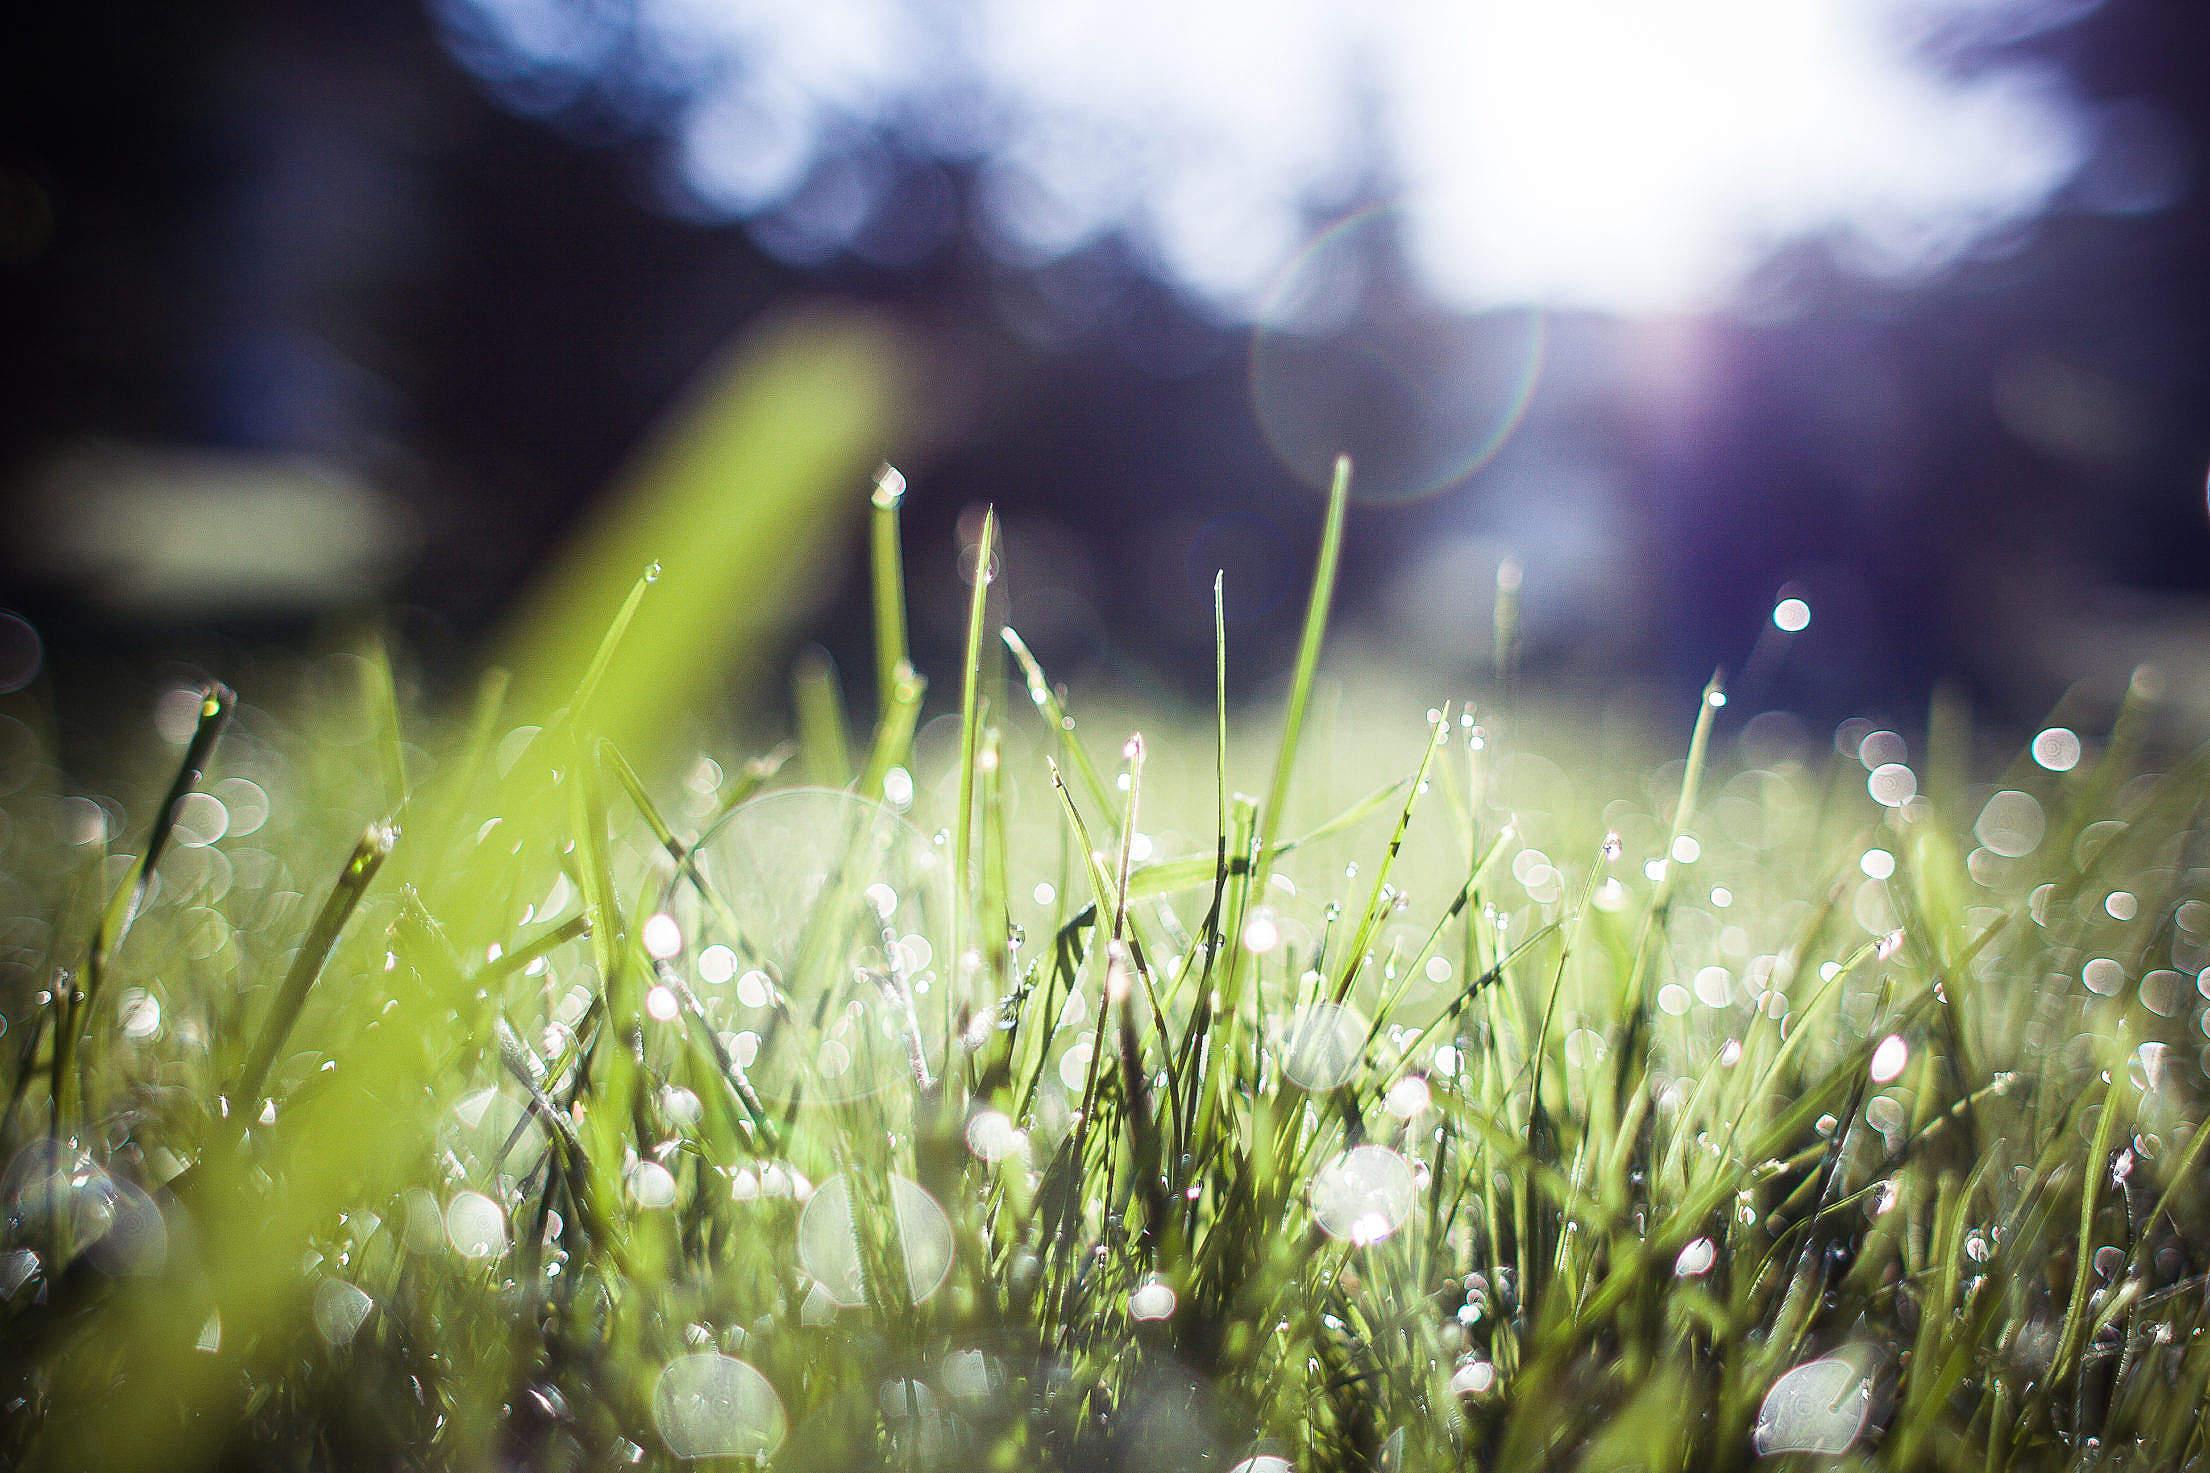 Grass Blue Feelings Free Stock Photo